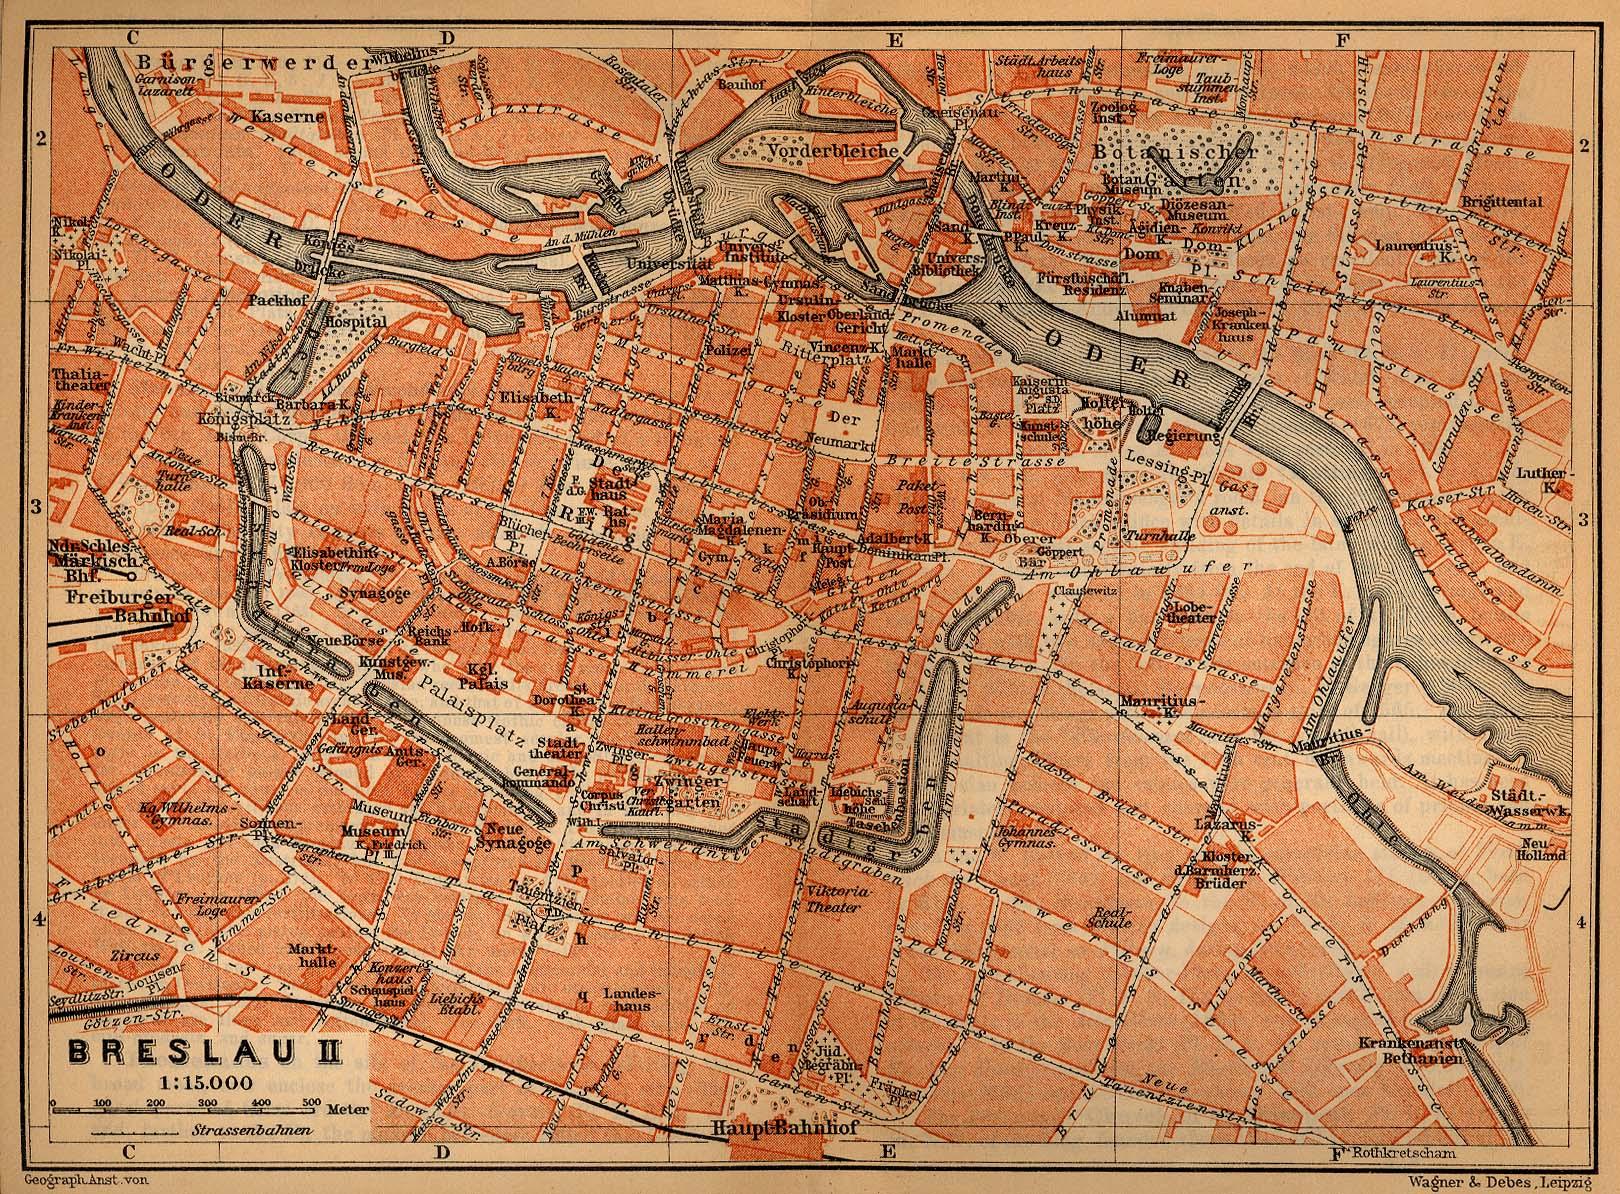 Wroclaw (Breslau) Inner Town Map, Poland 1910